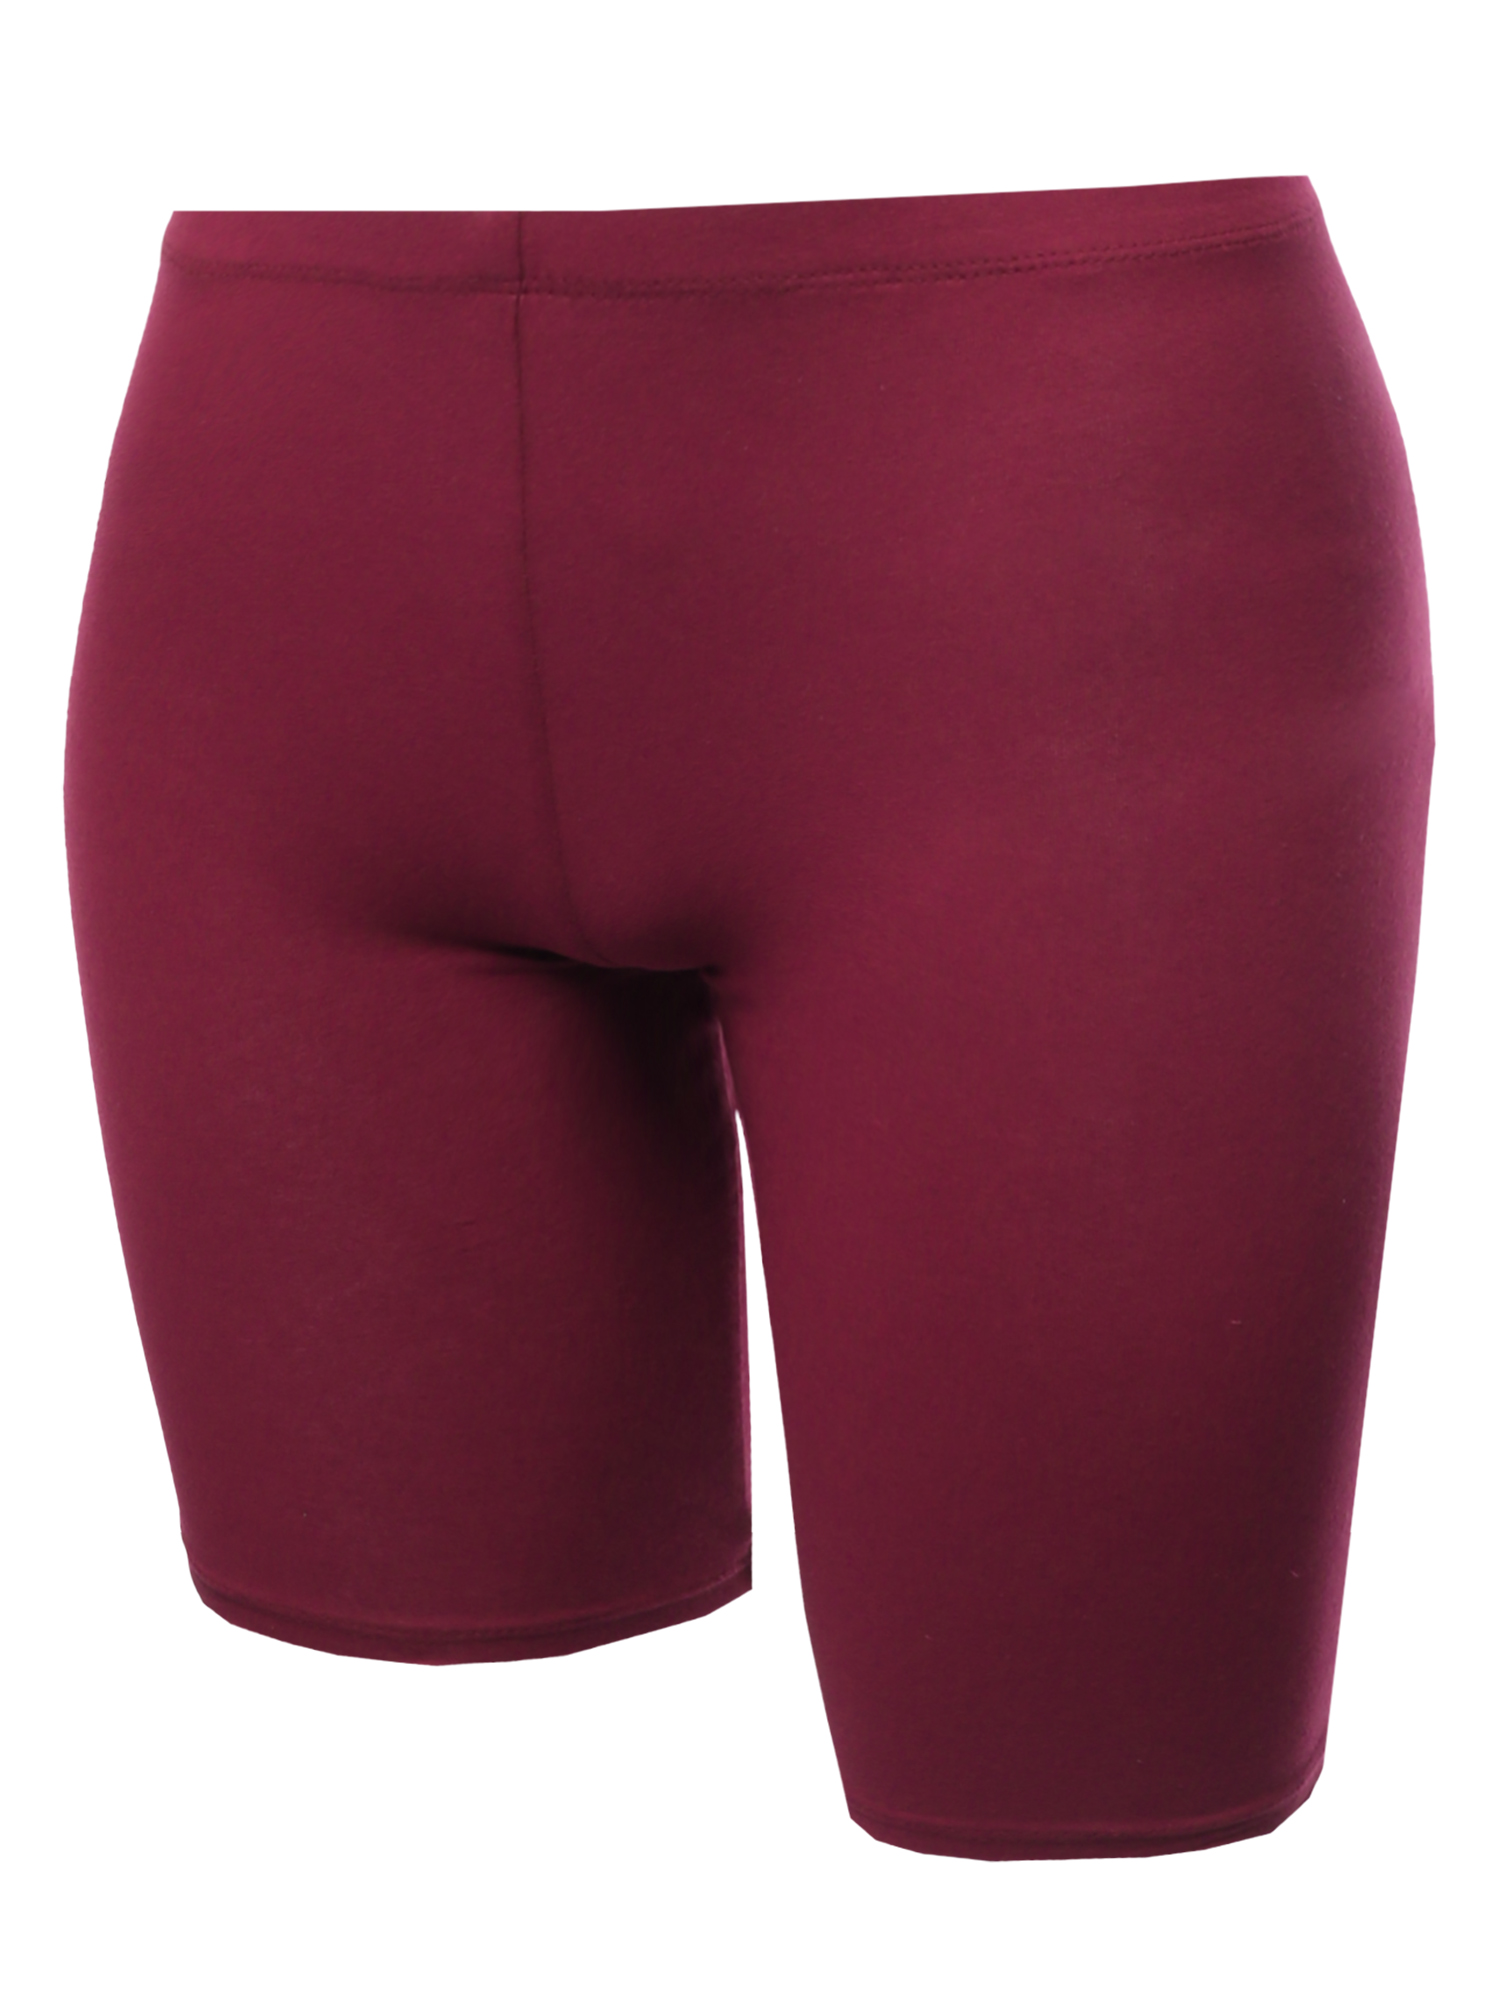 ac8cc753db FashionOutfit Women's Bike Yoga Shorts Cotton Spandex Stretch Boyshorts